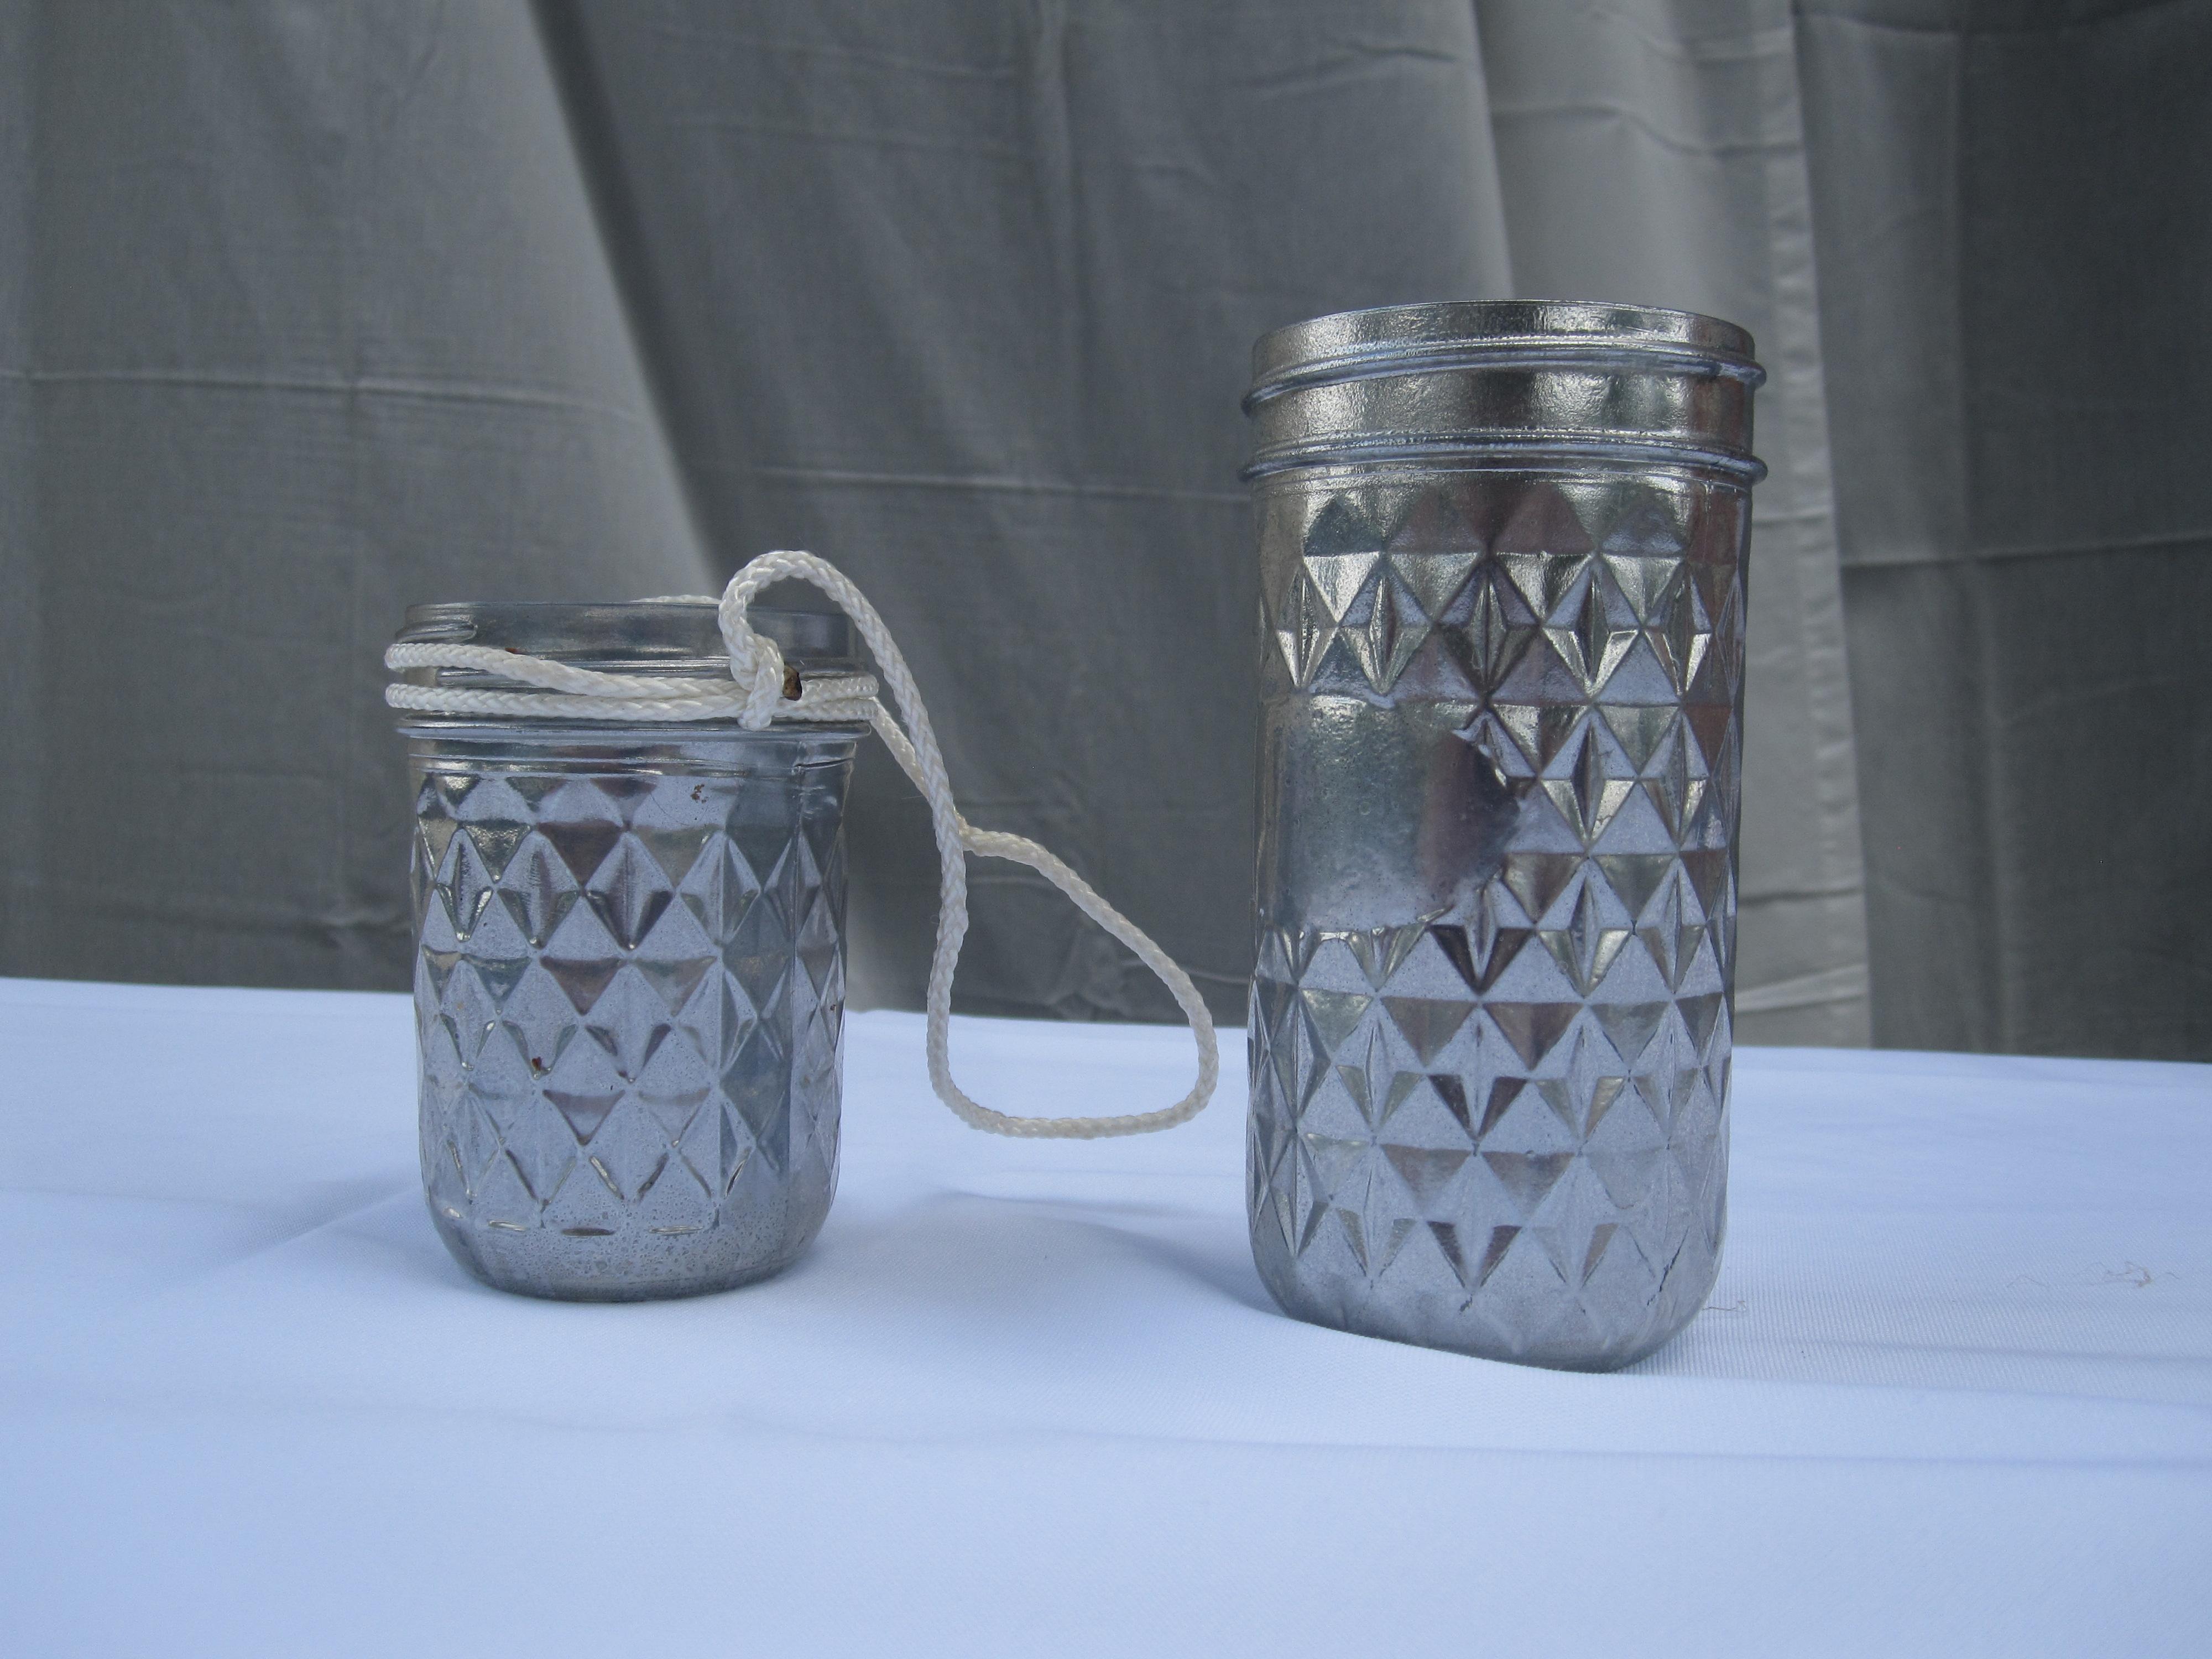 Silver jars